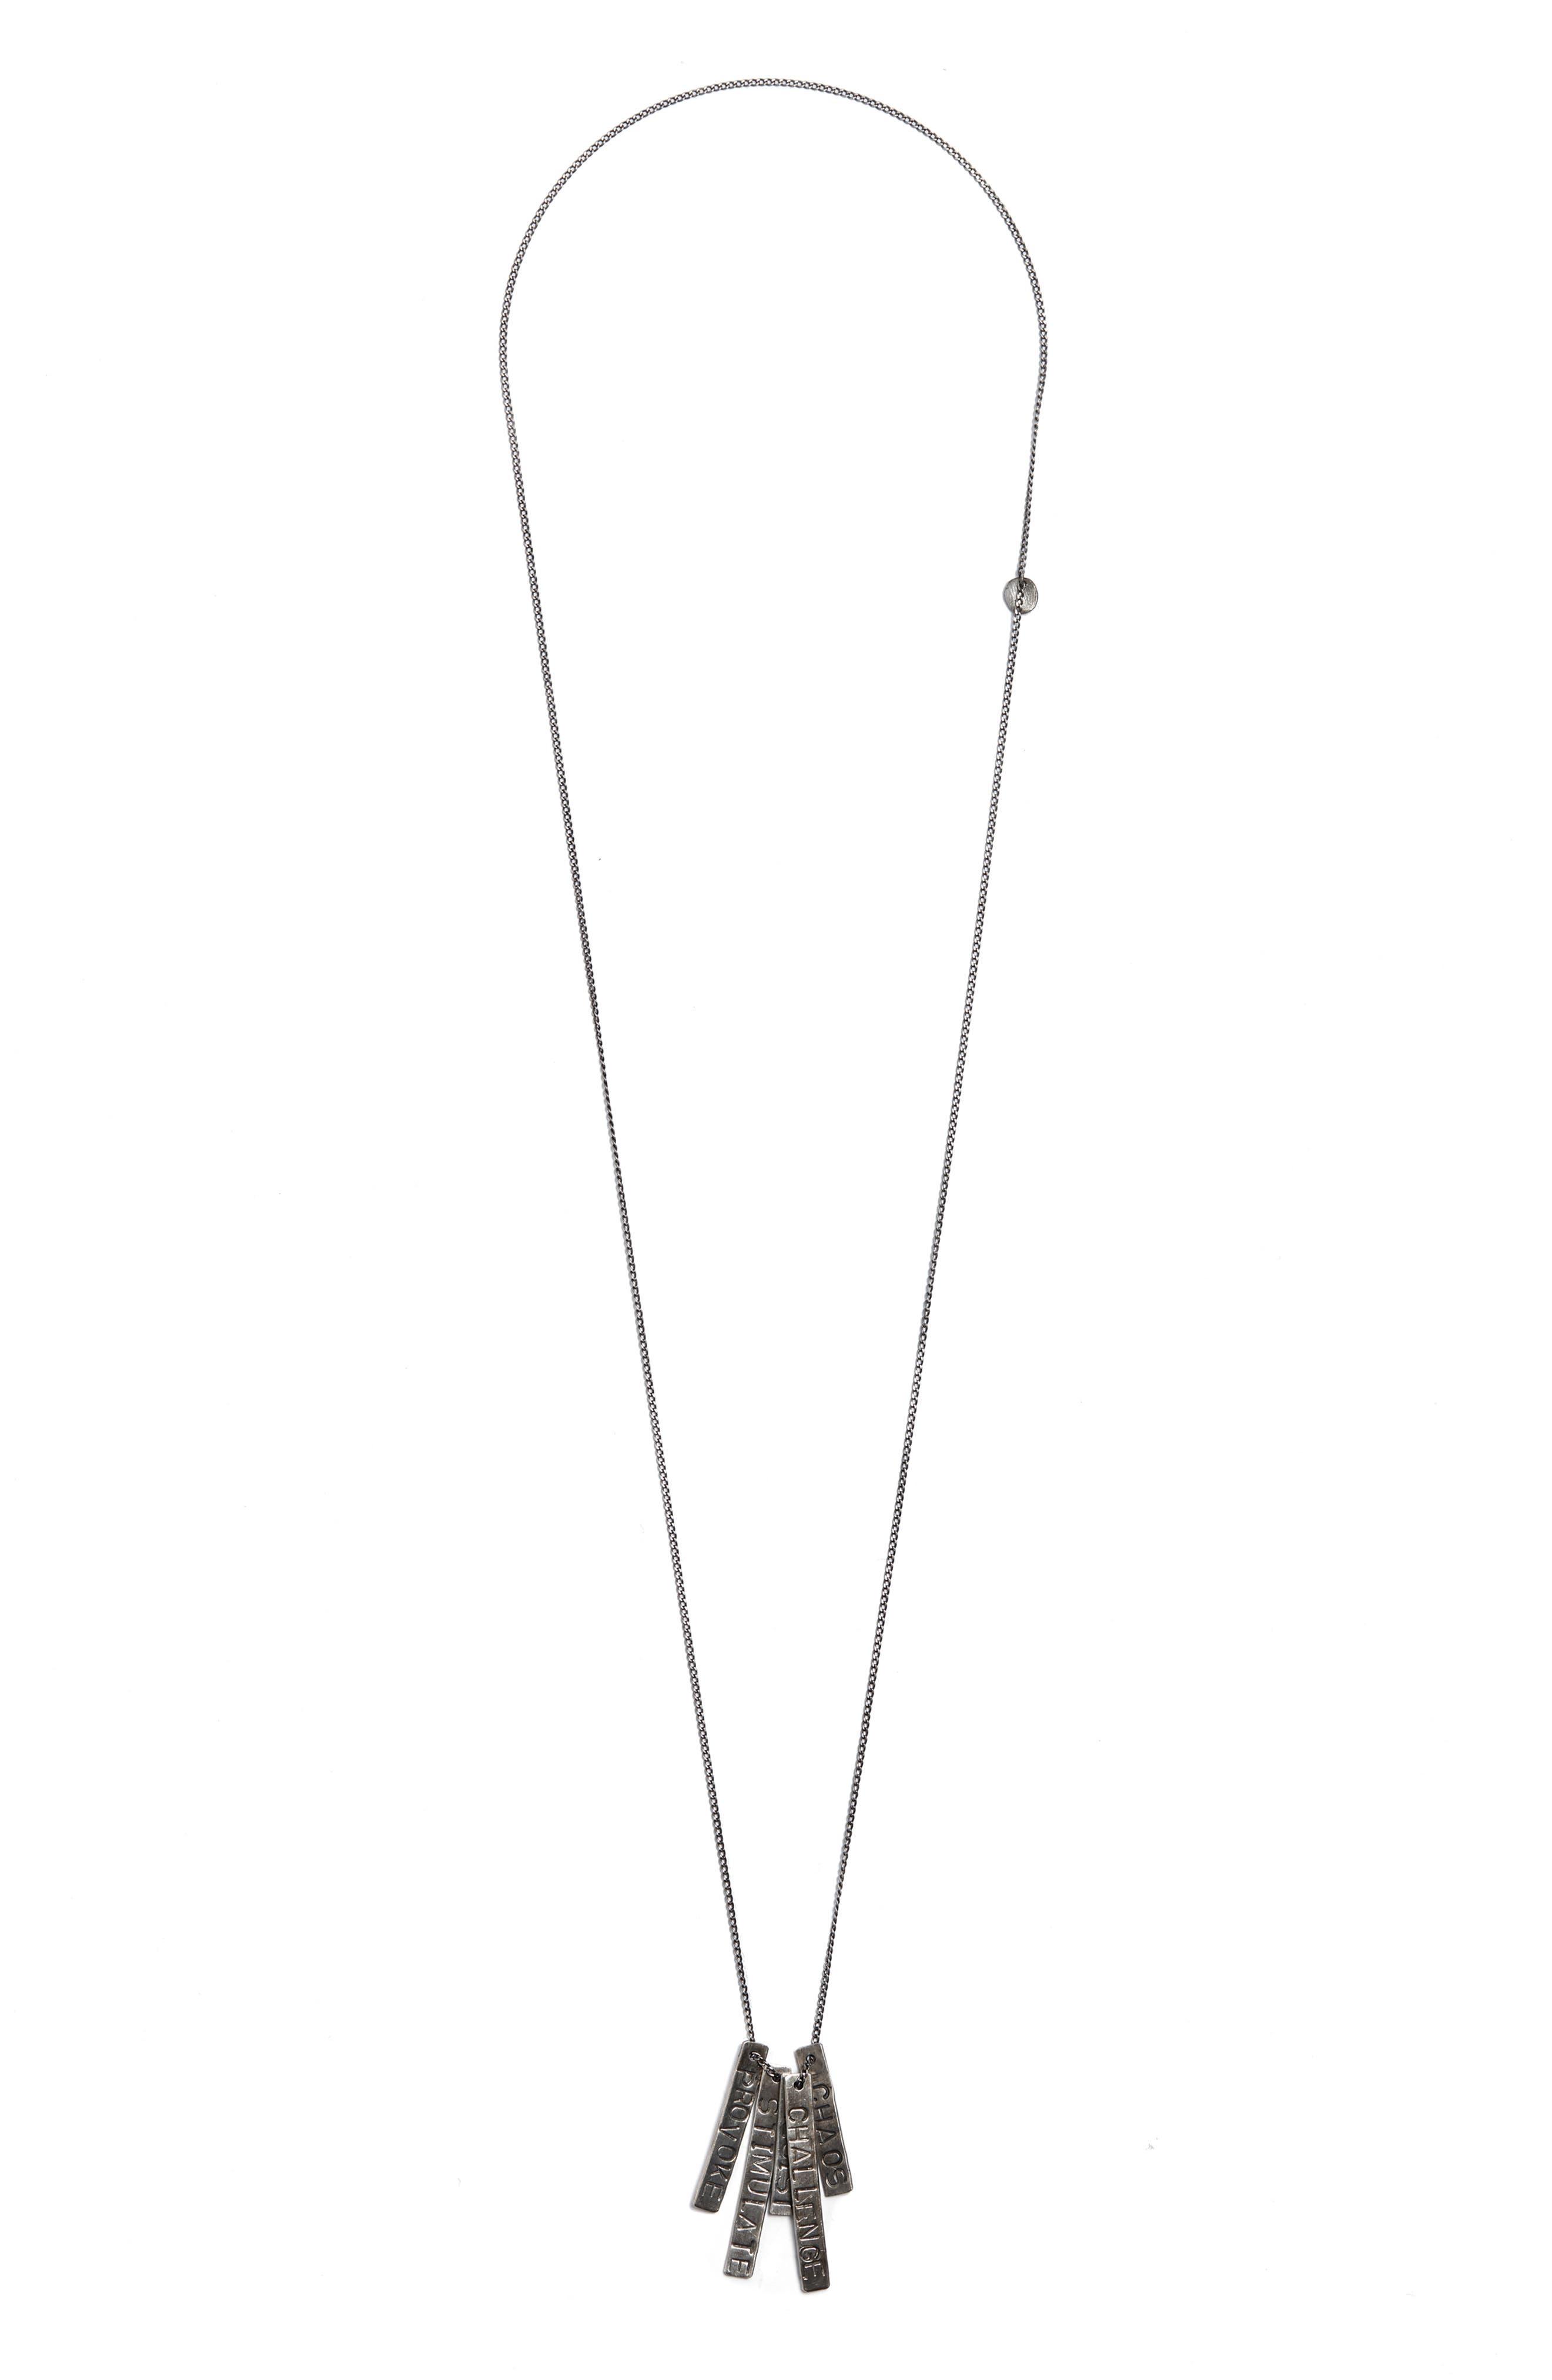 Provoke/Stimulate ID Tag Necklace,                         Main,                         color, SILVER